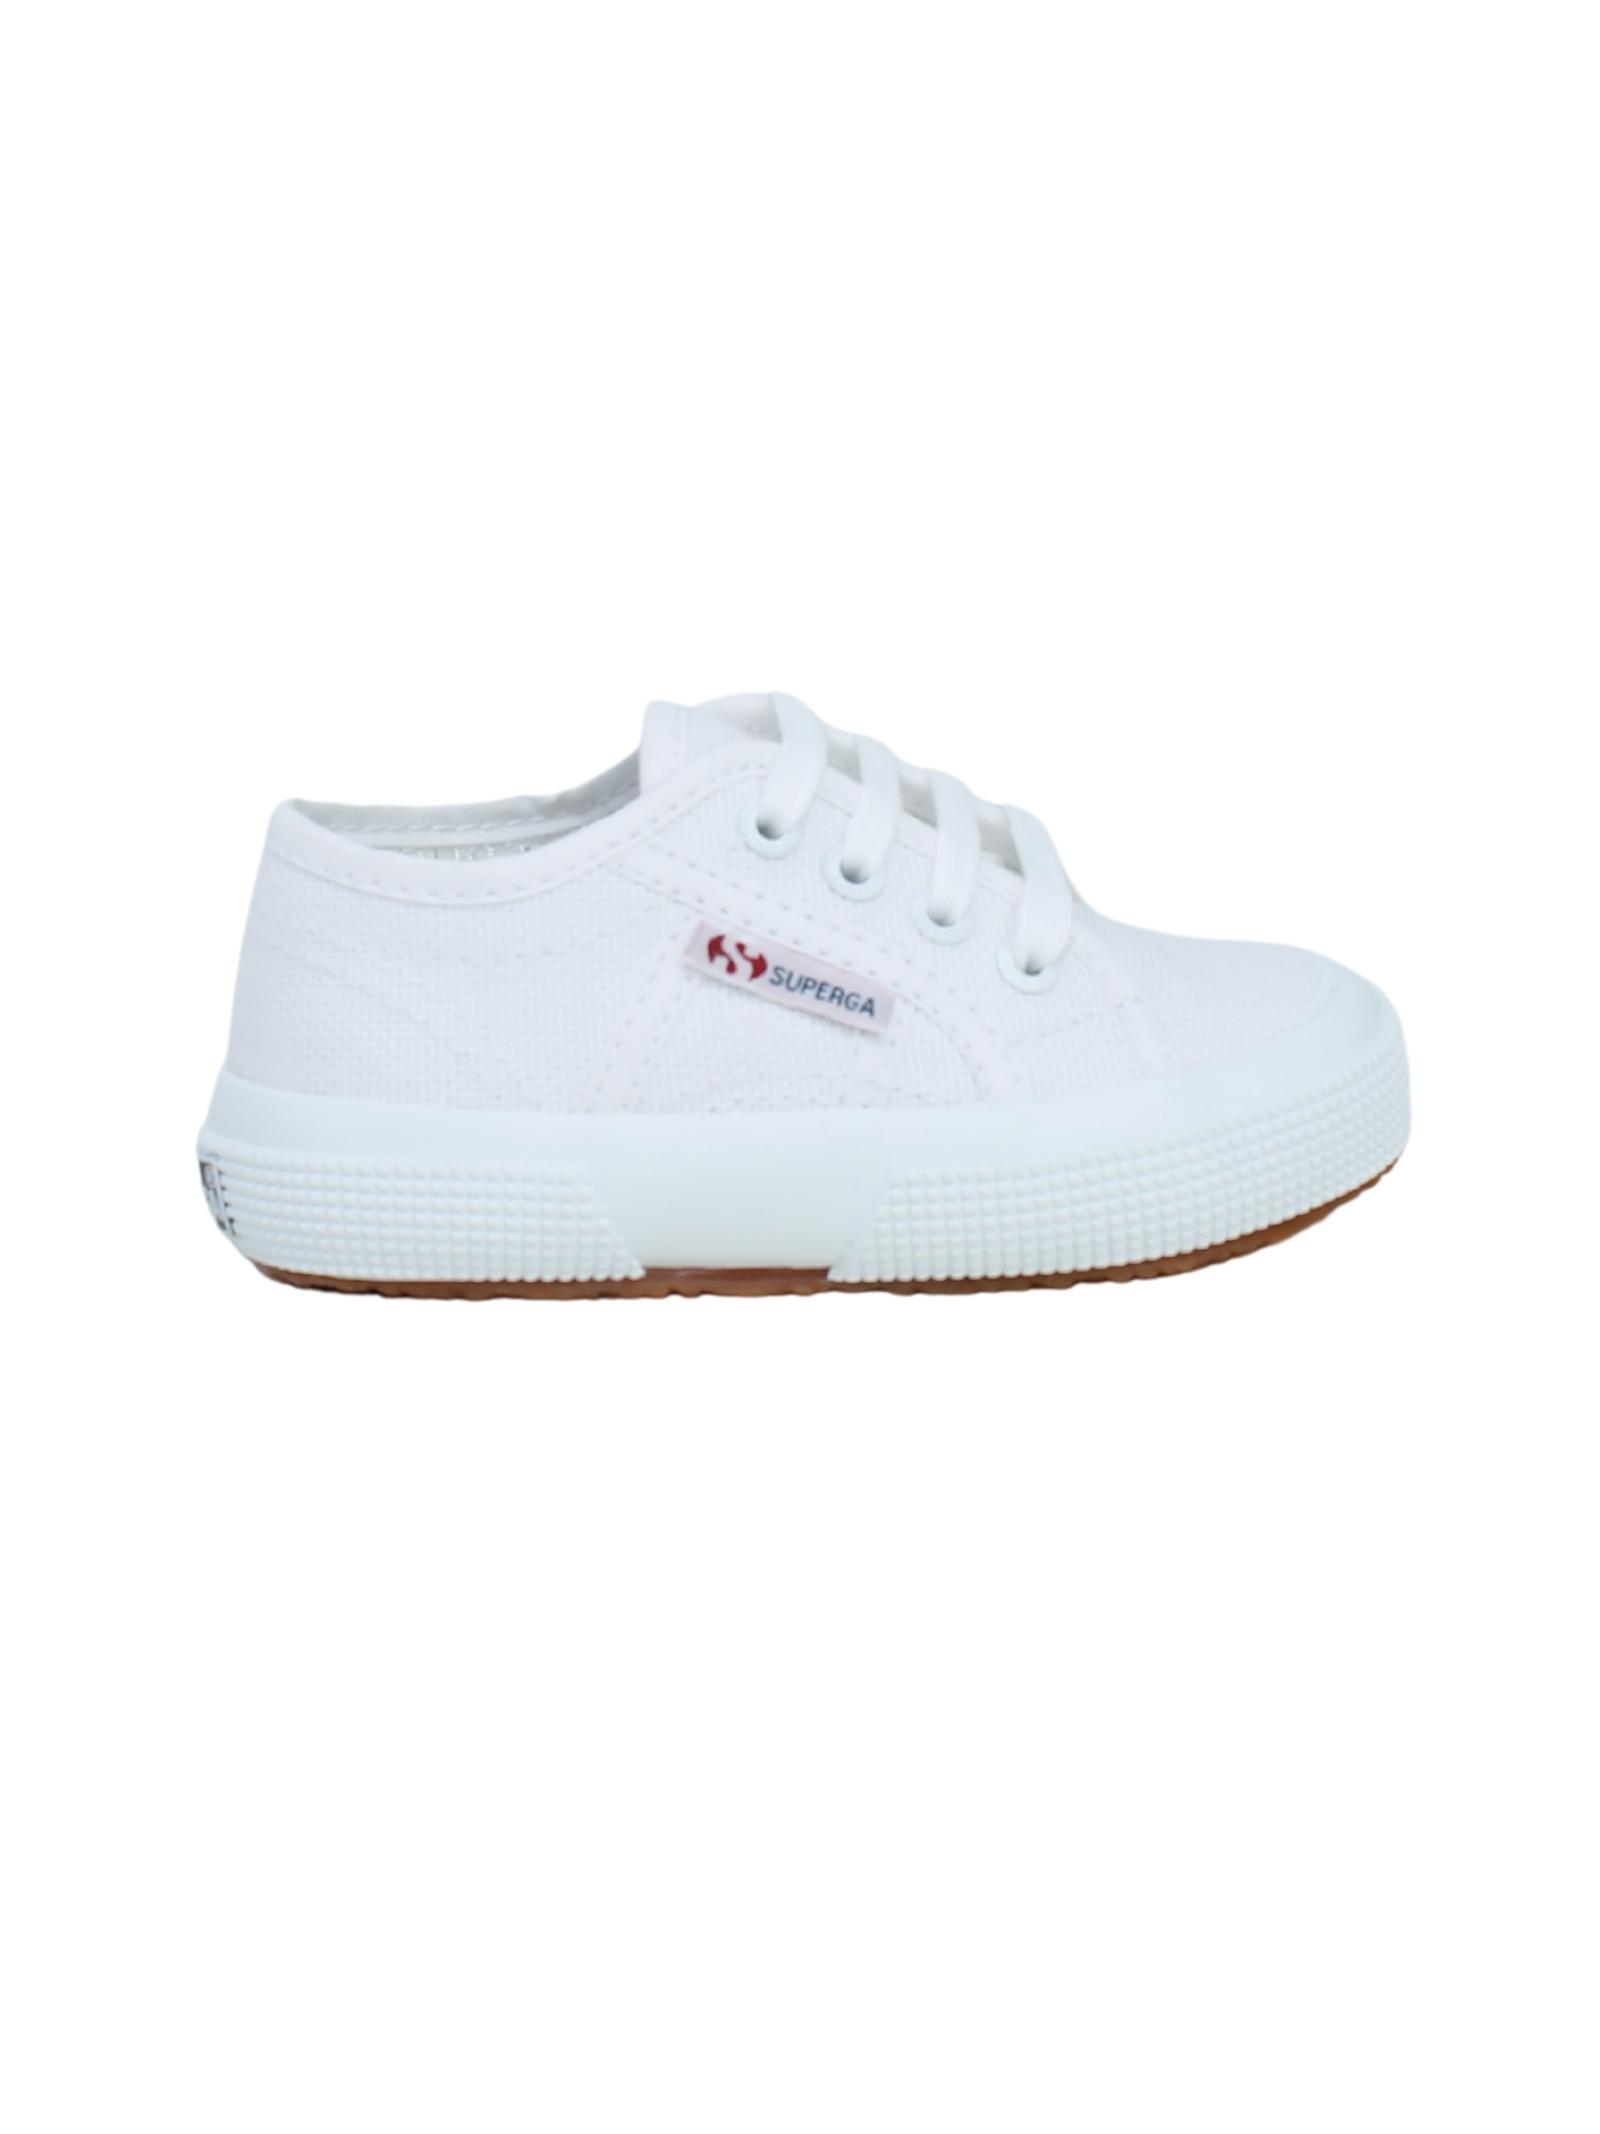 SUPERGA KIDS | Sneakers | 2750S00005P0901